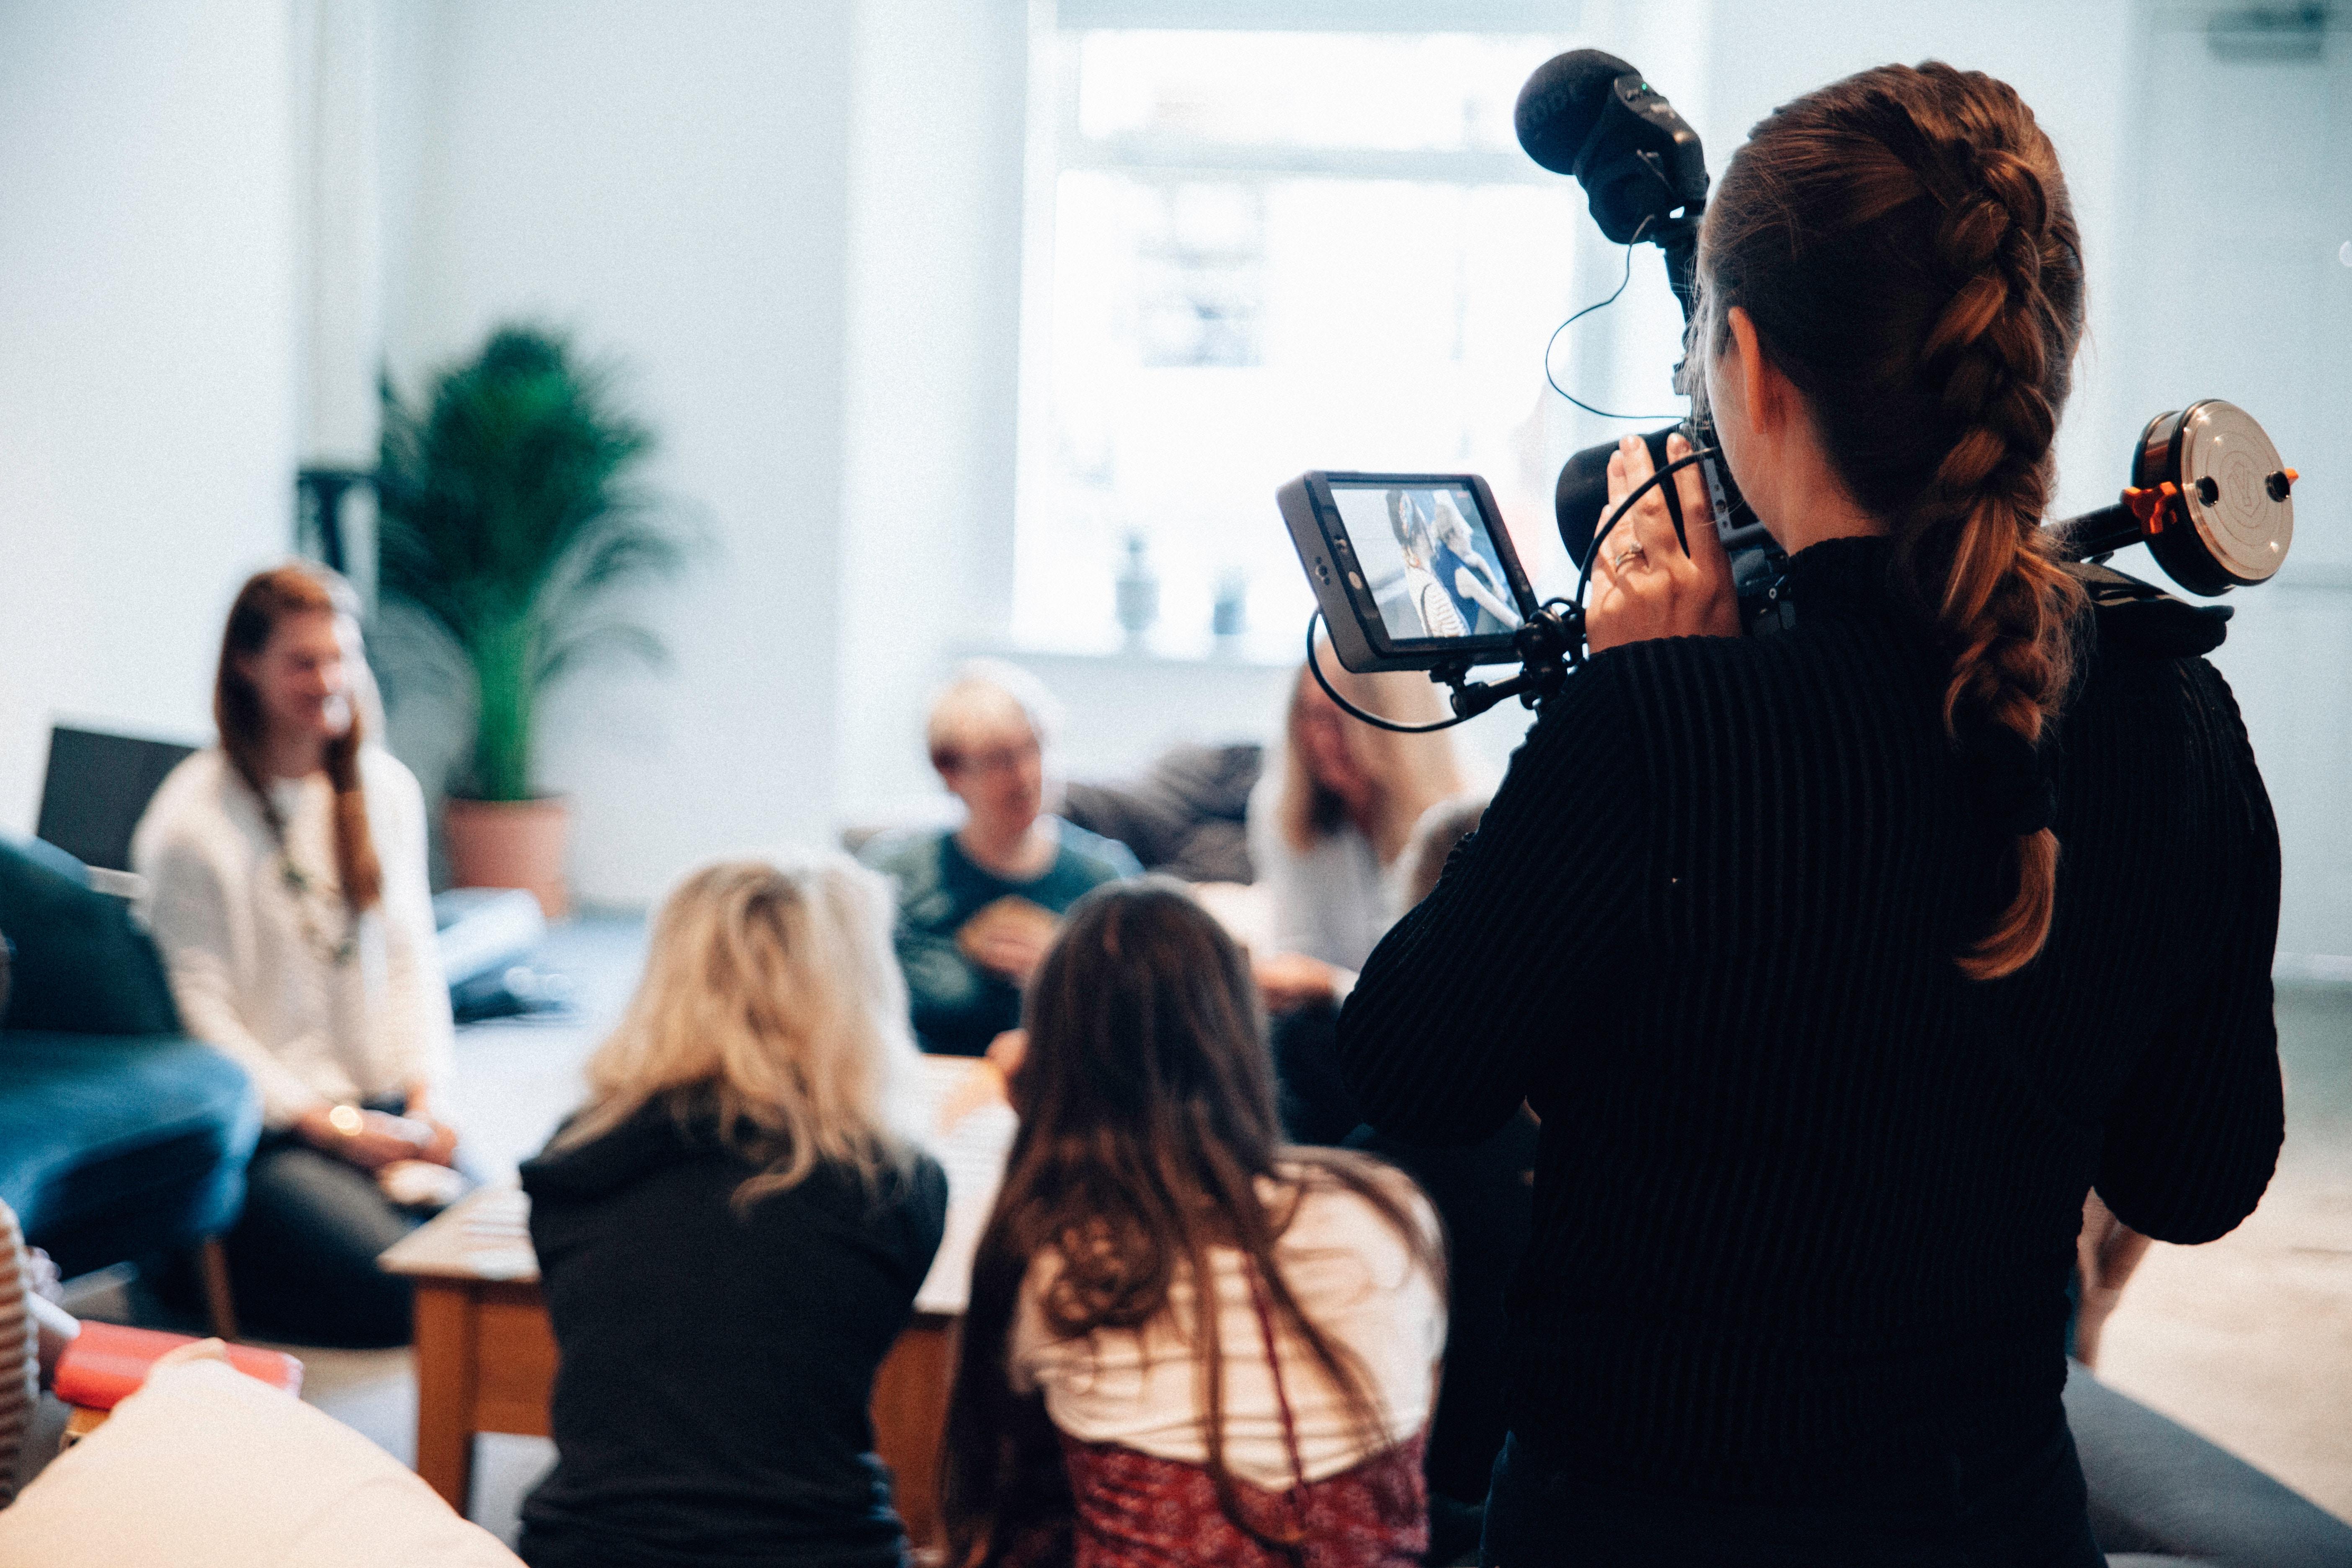 Brisbane videography